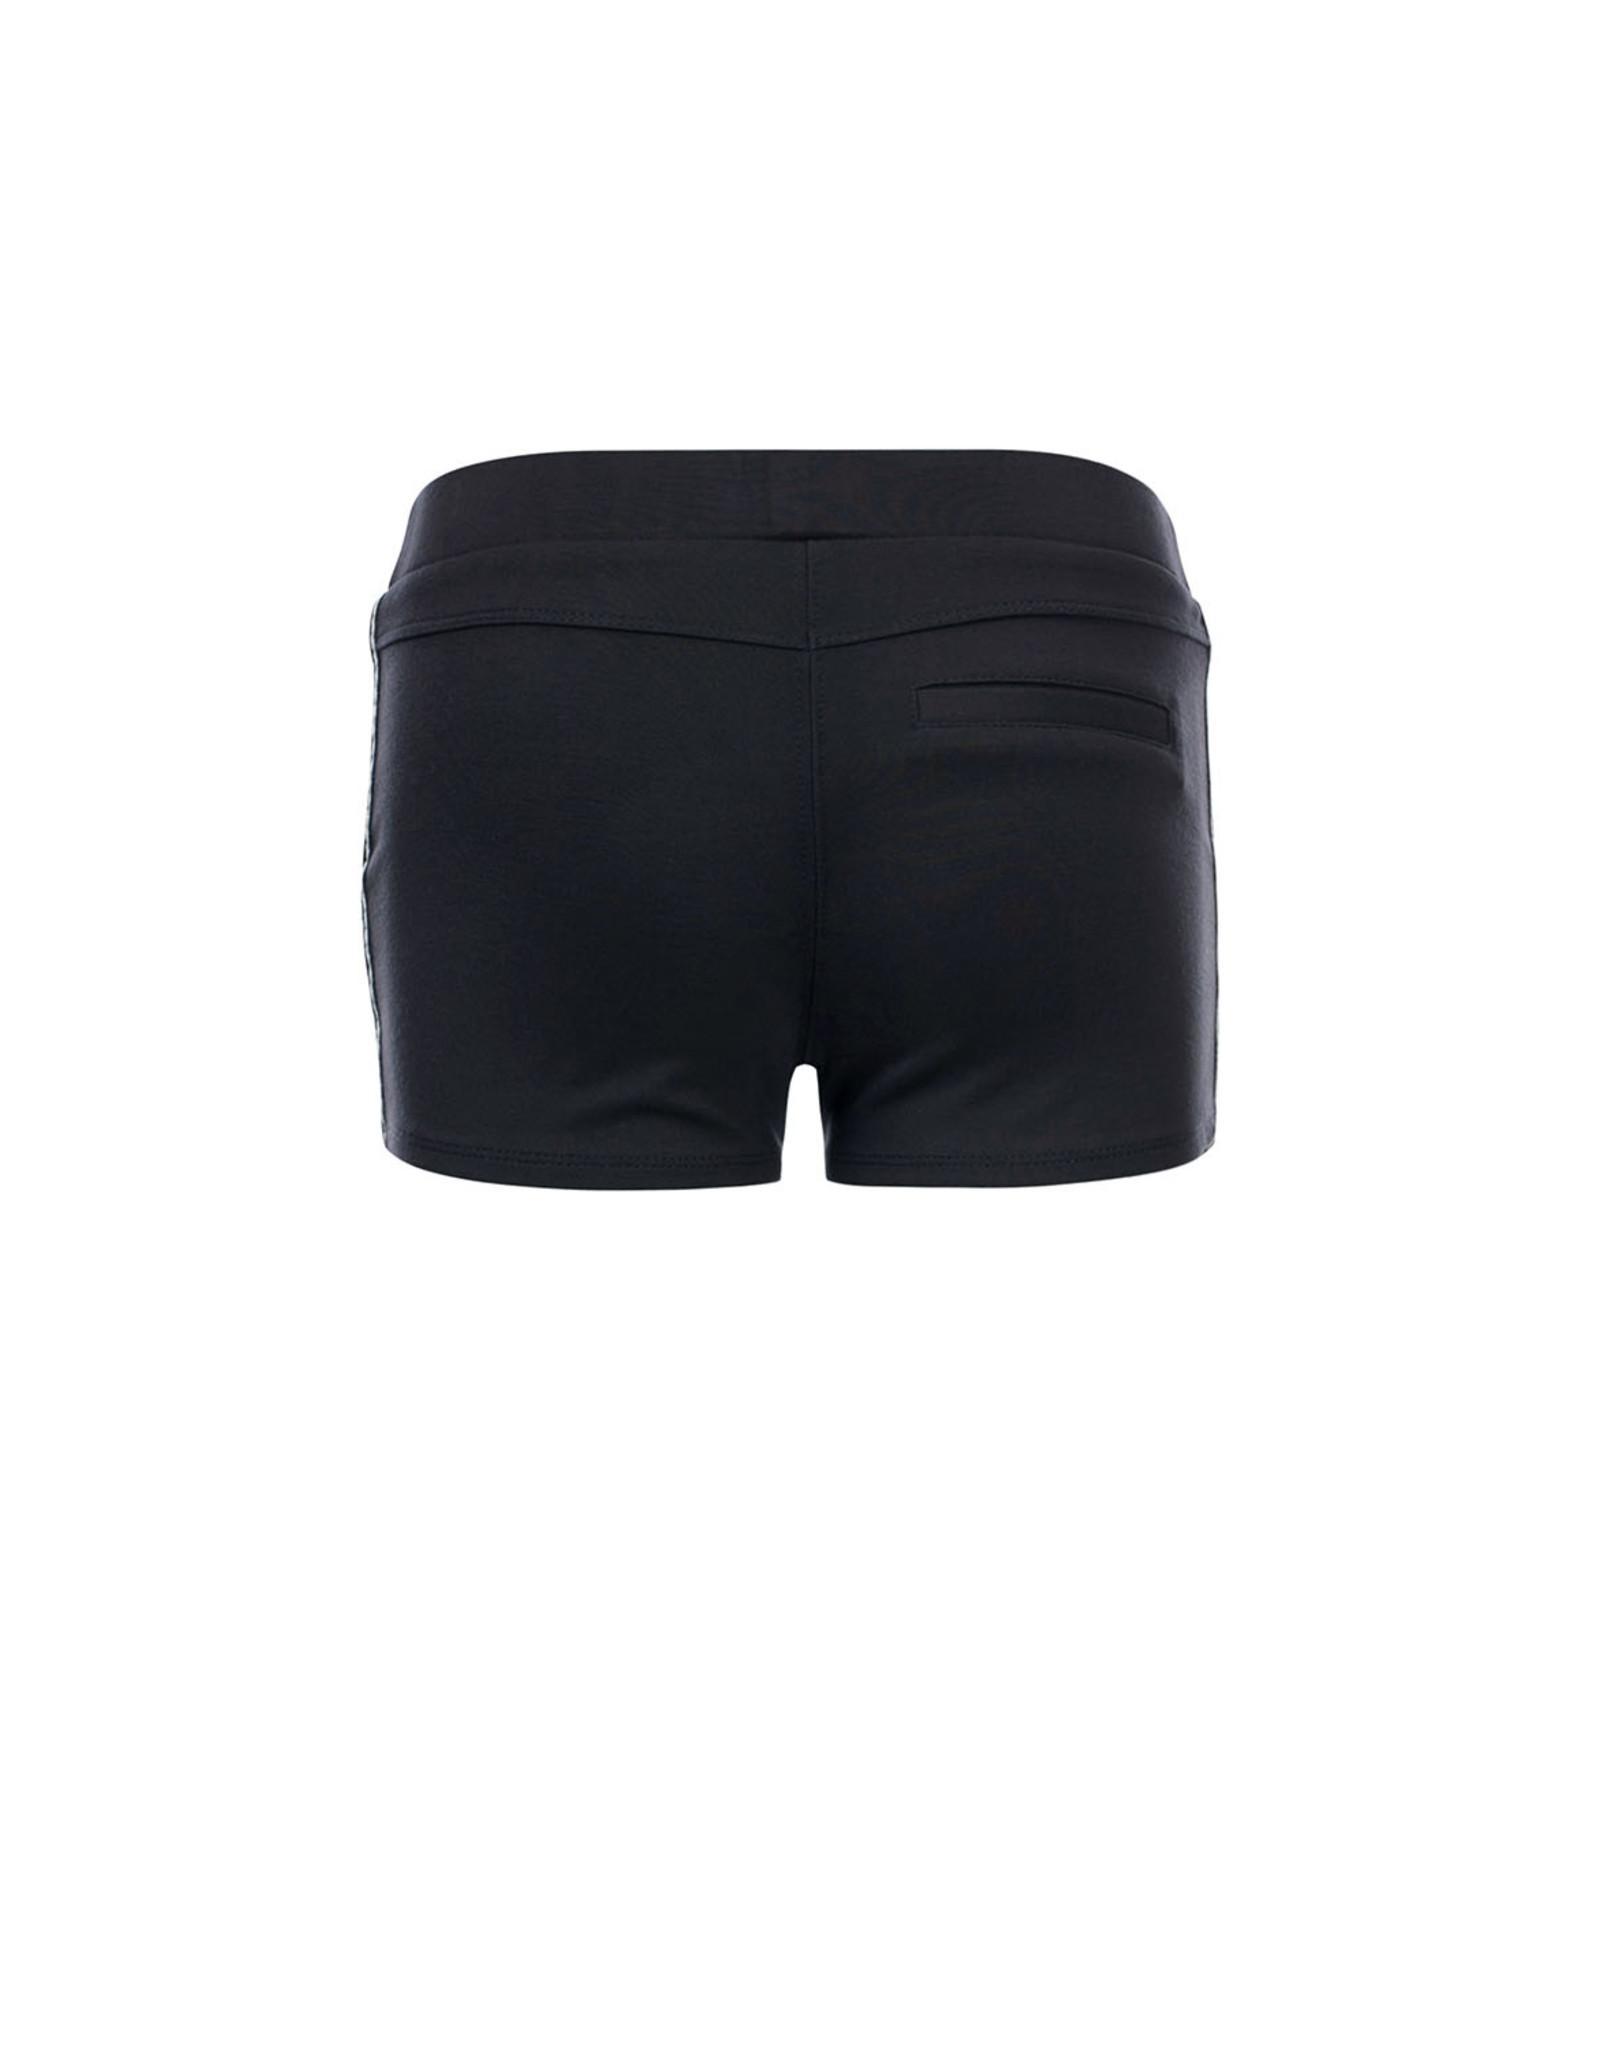 Looxs 10SIXTEEN 10Sixteen Interlock shorts raven